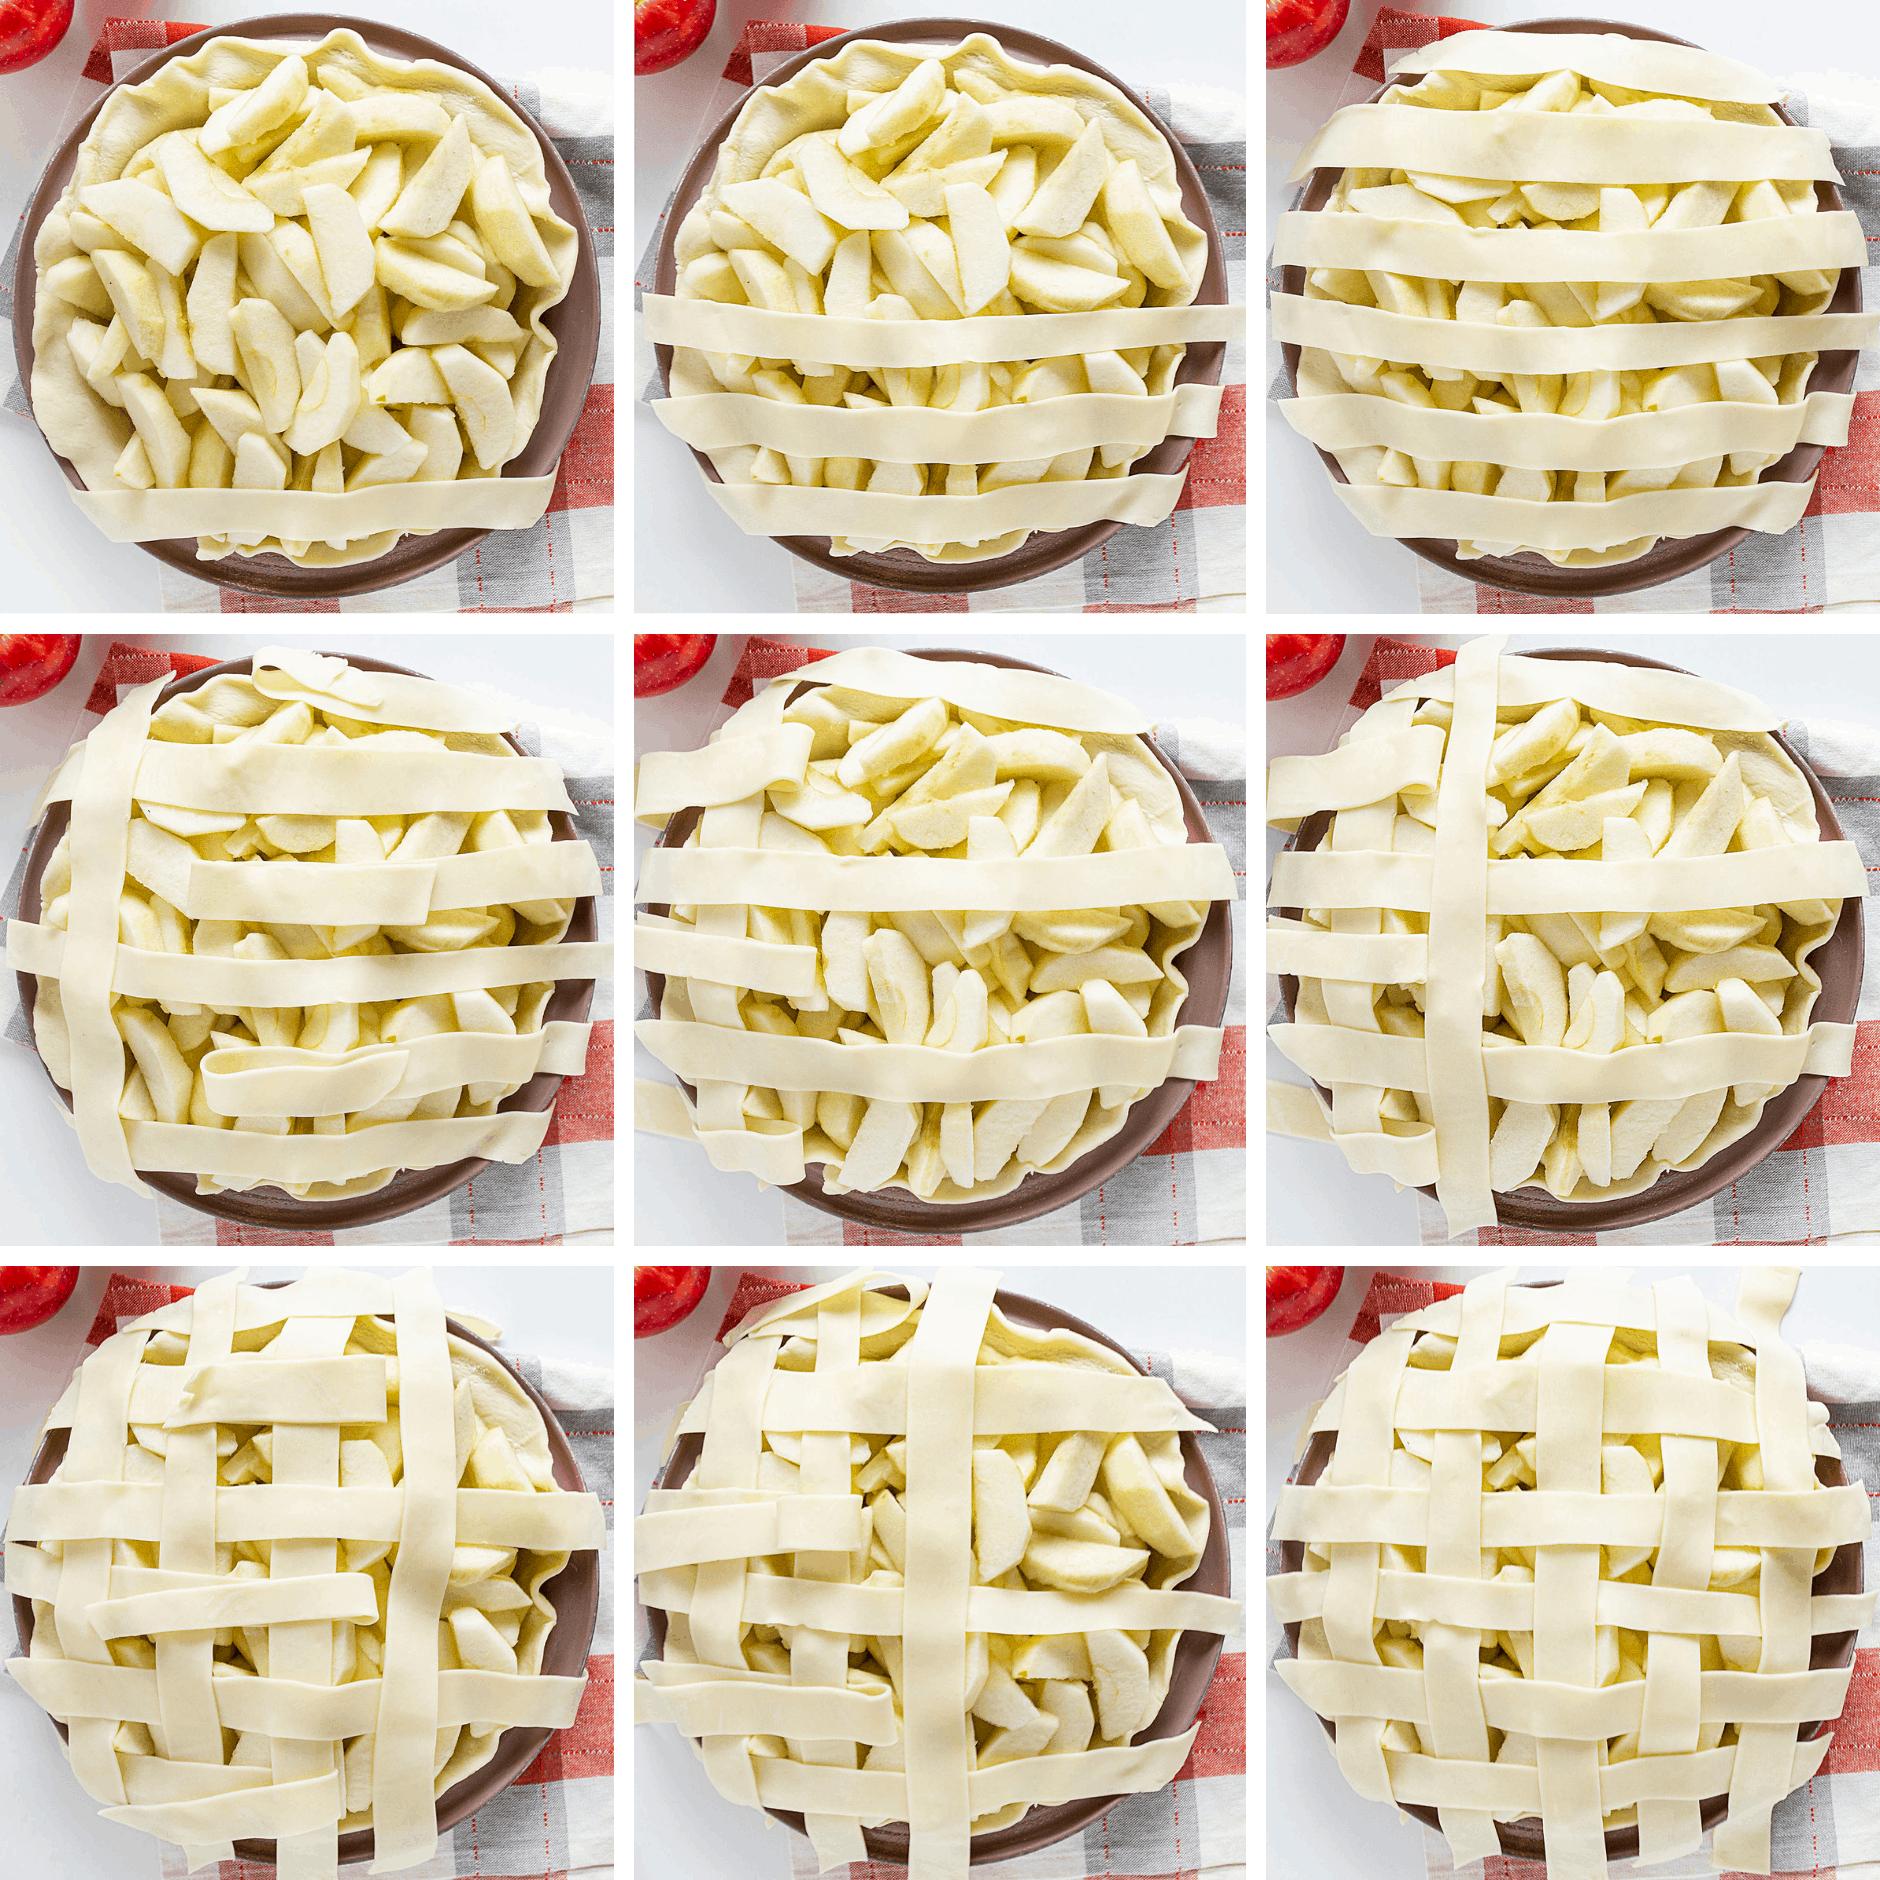 How to Make a Lattice Pie Crust on a Caramel Apple Pie